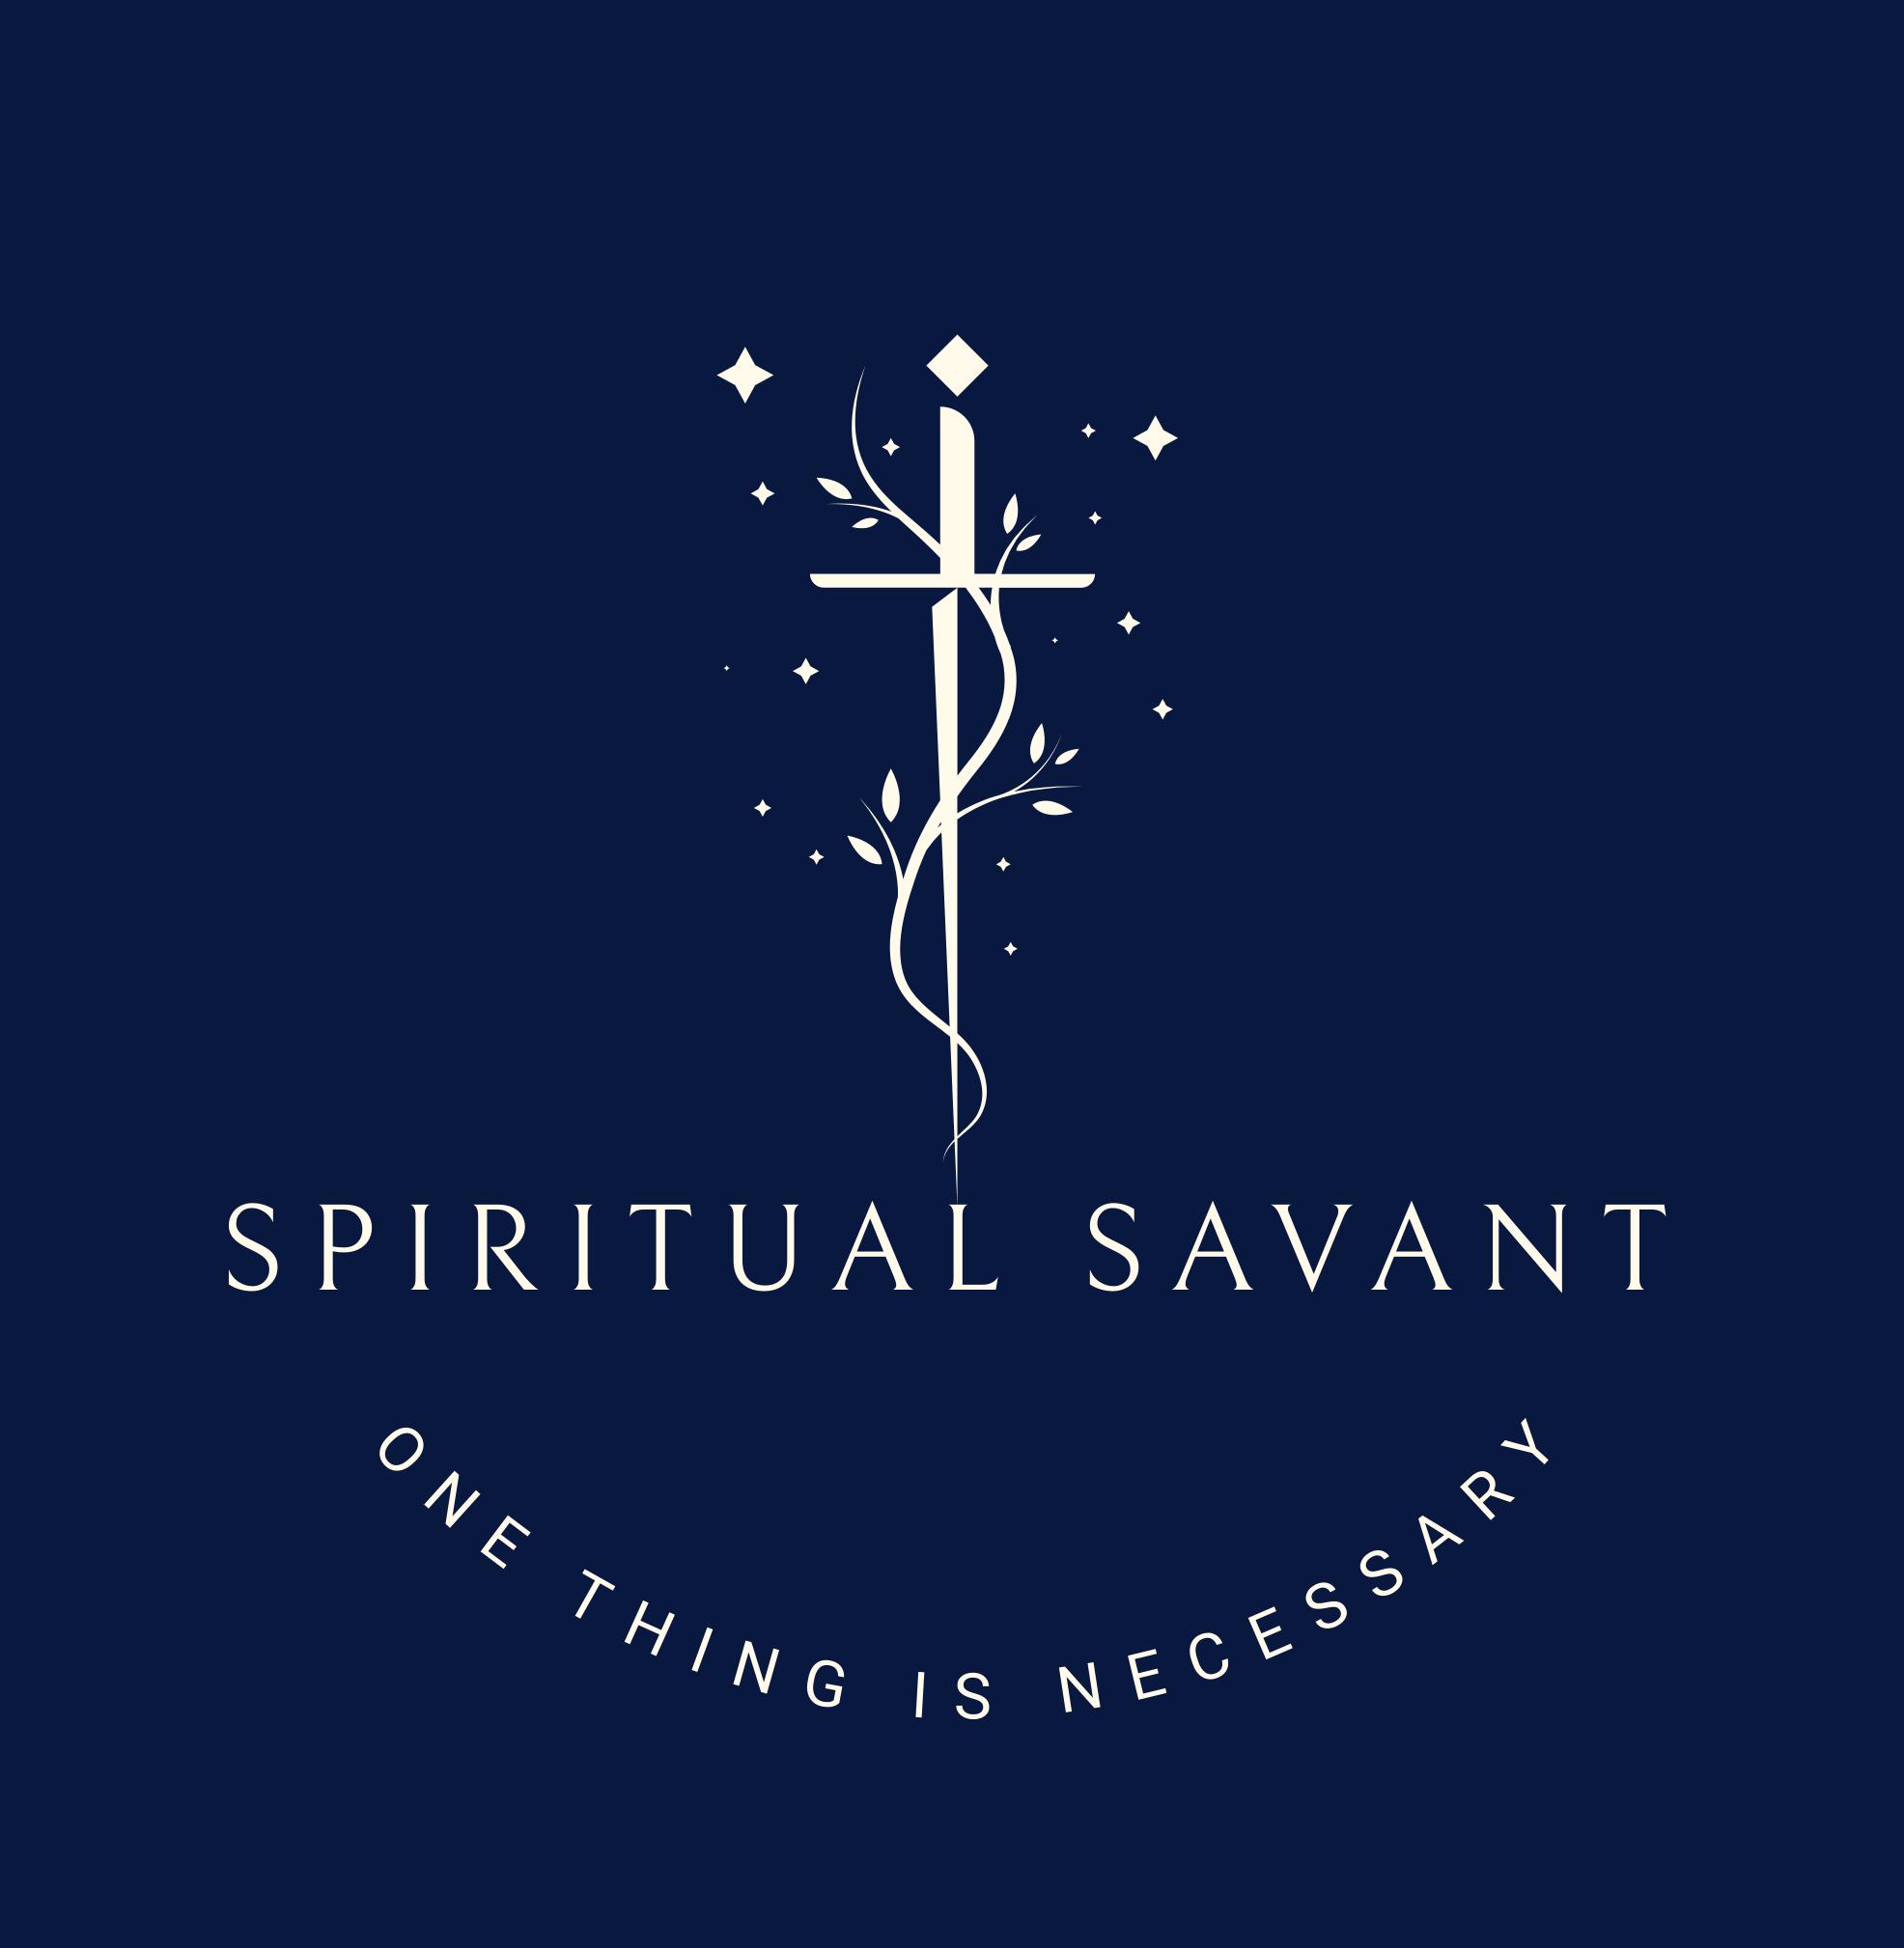 Spiritual Savant